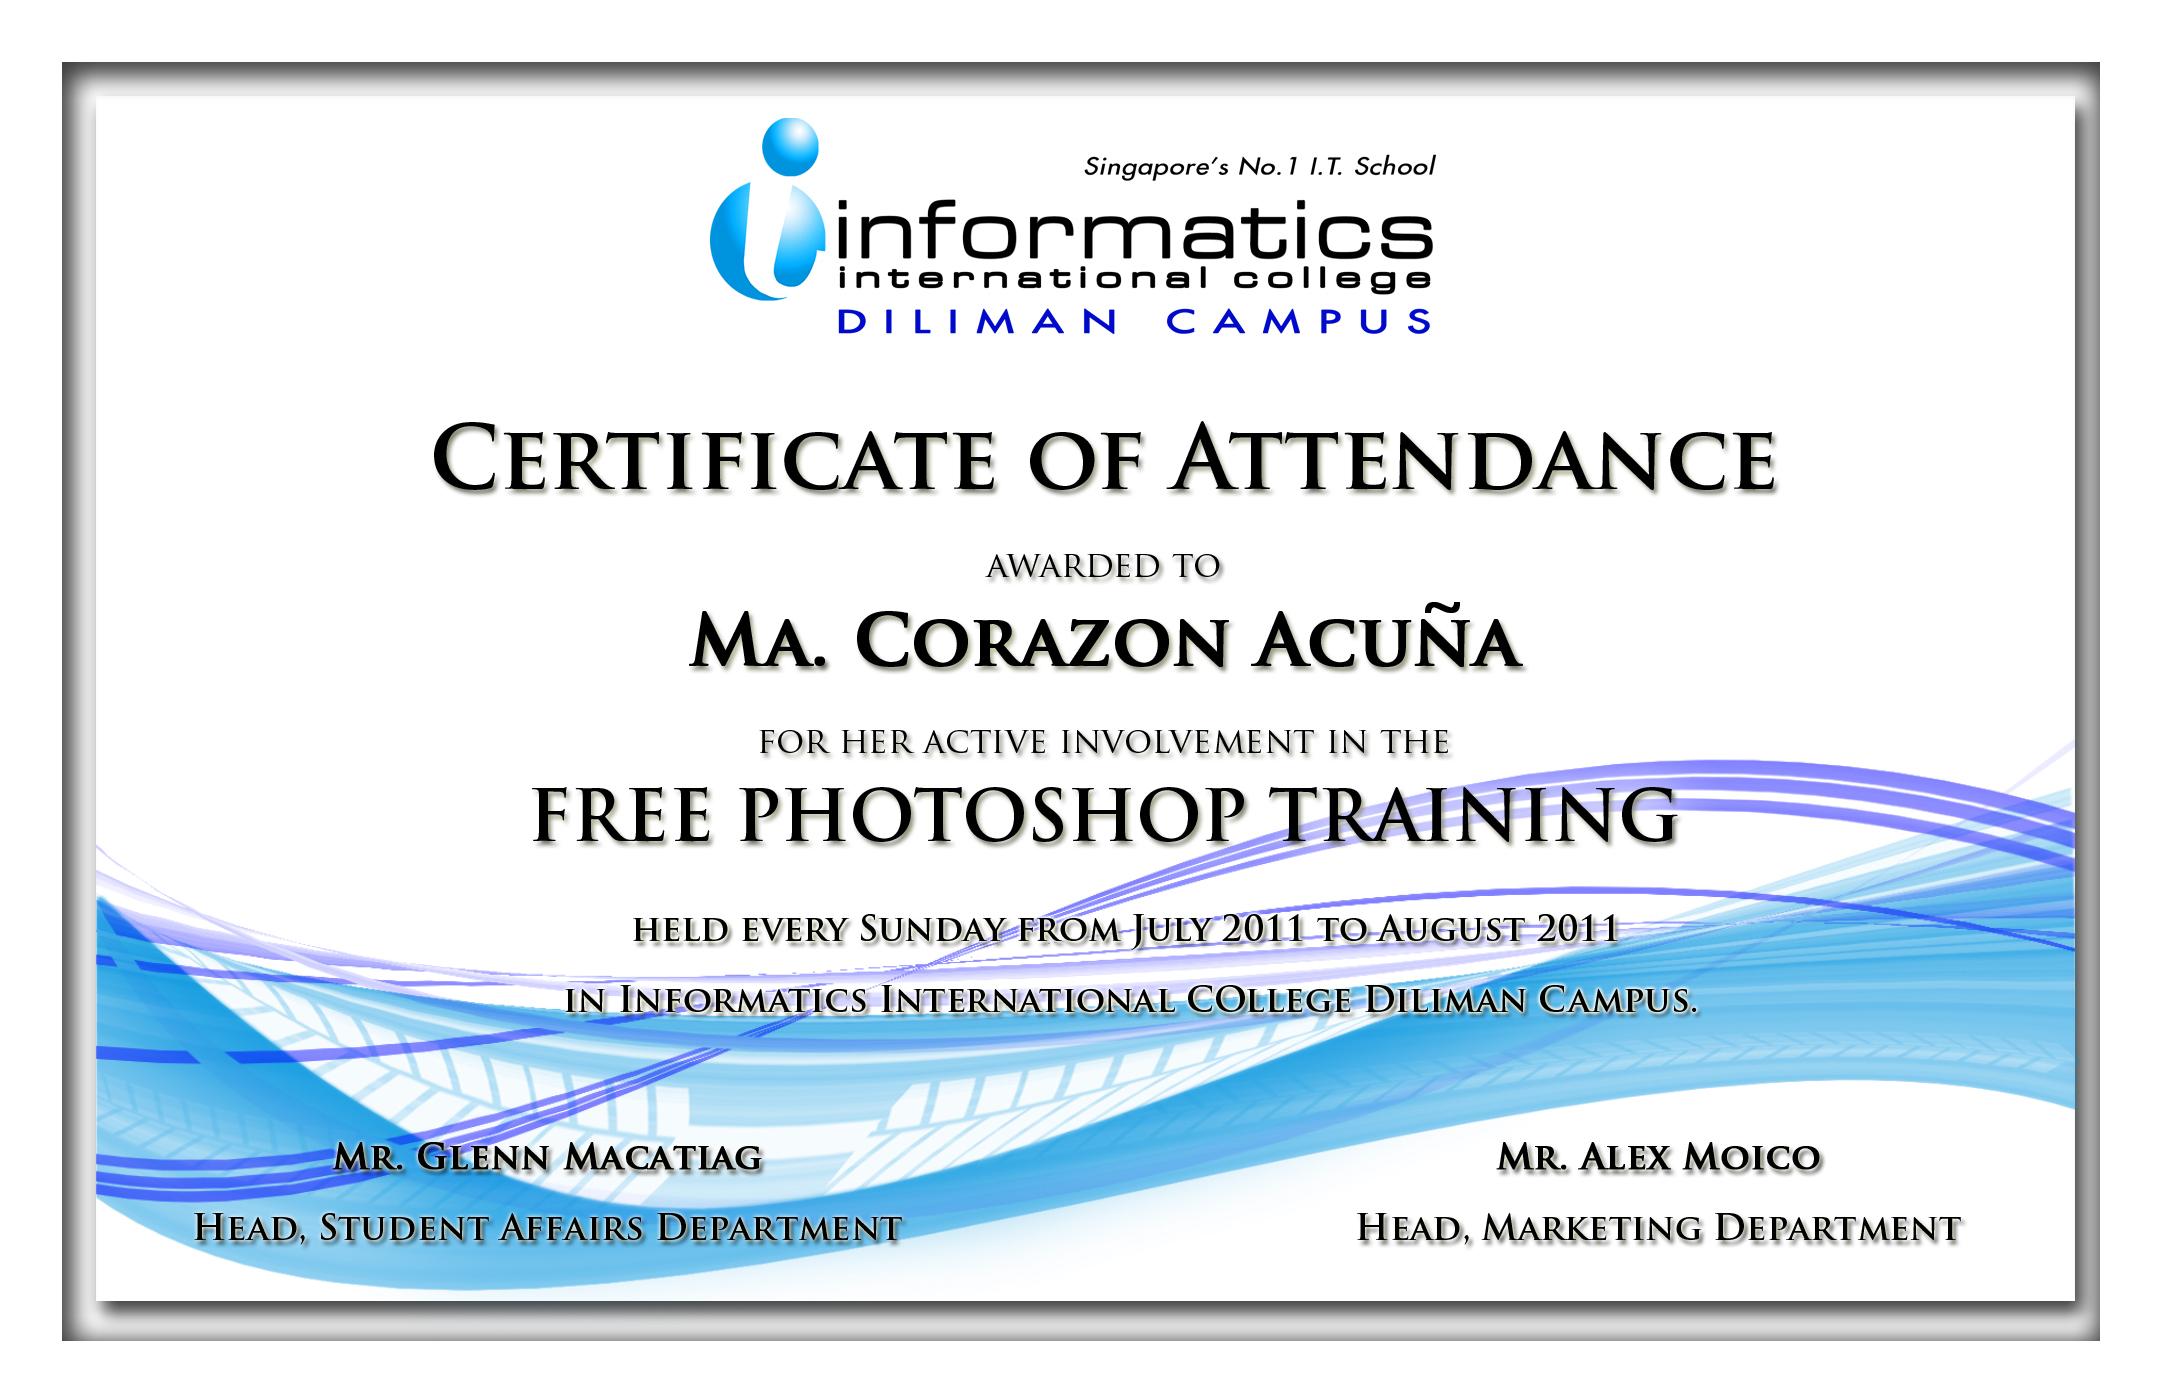 Certificate Templates by maricris jannine jamig at Coroflot – Corporate Certificate Template